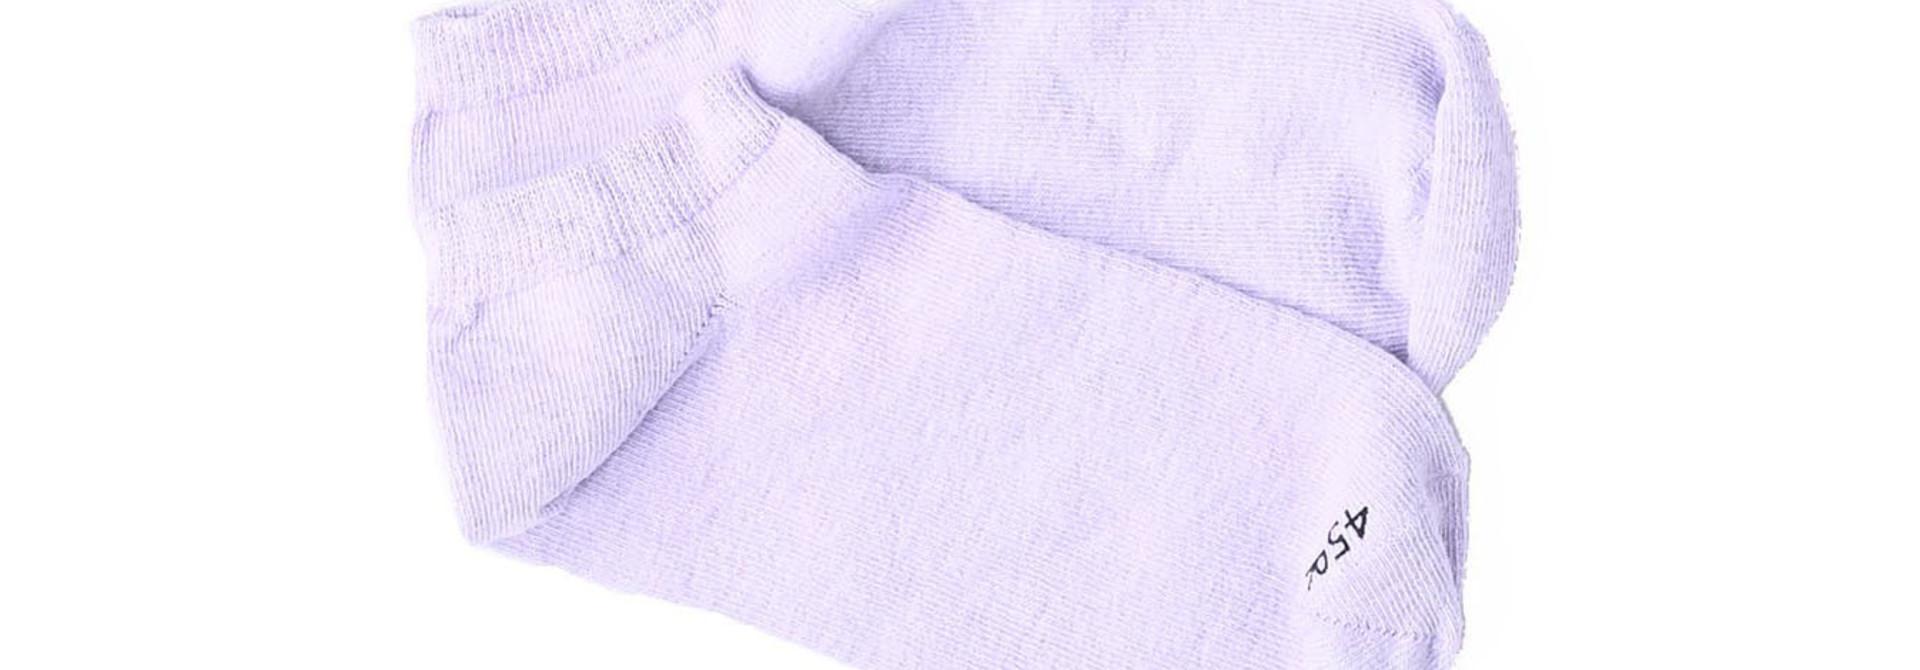 45 Star Ankle Socks (0421)